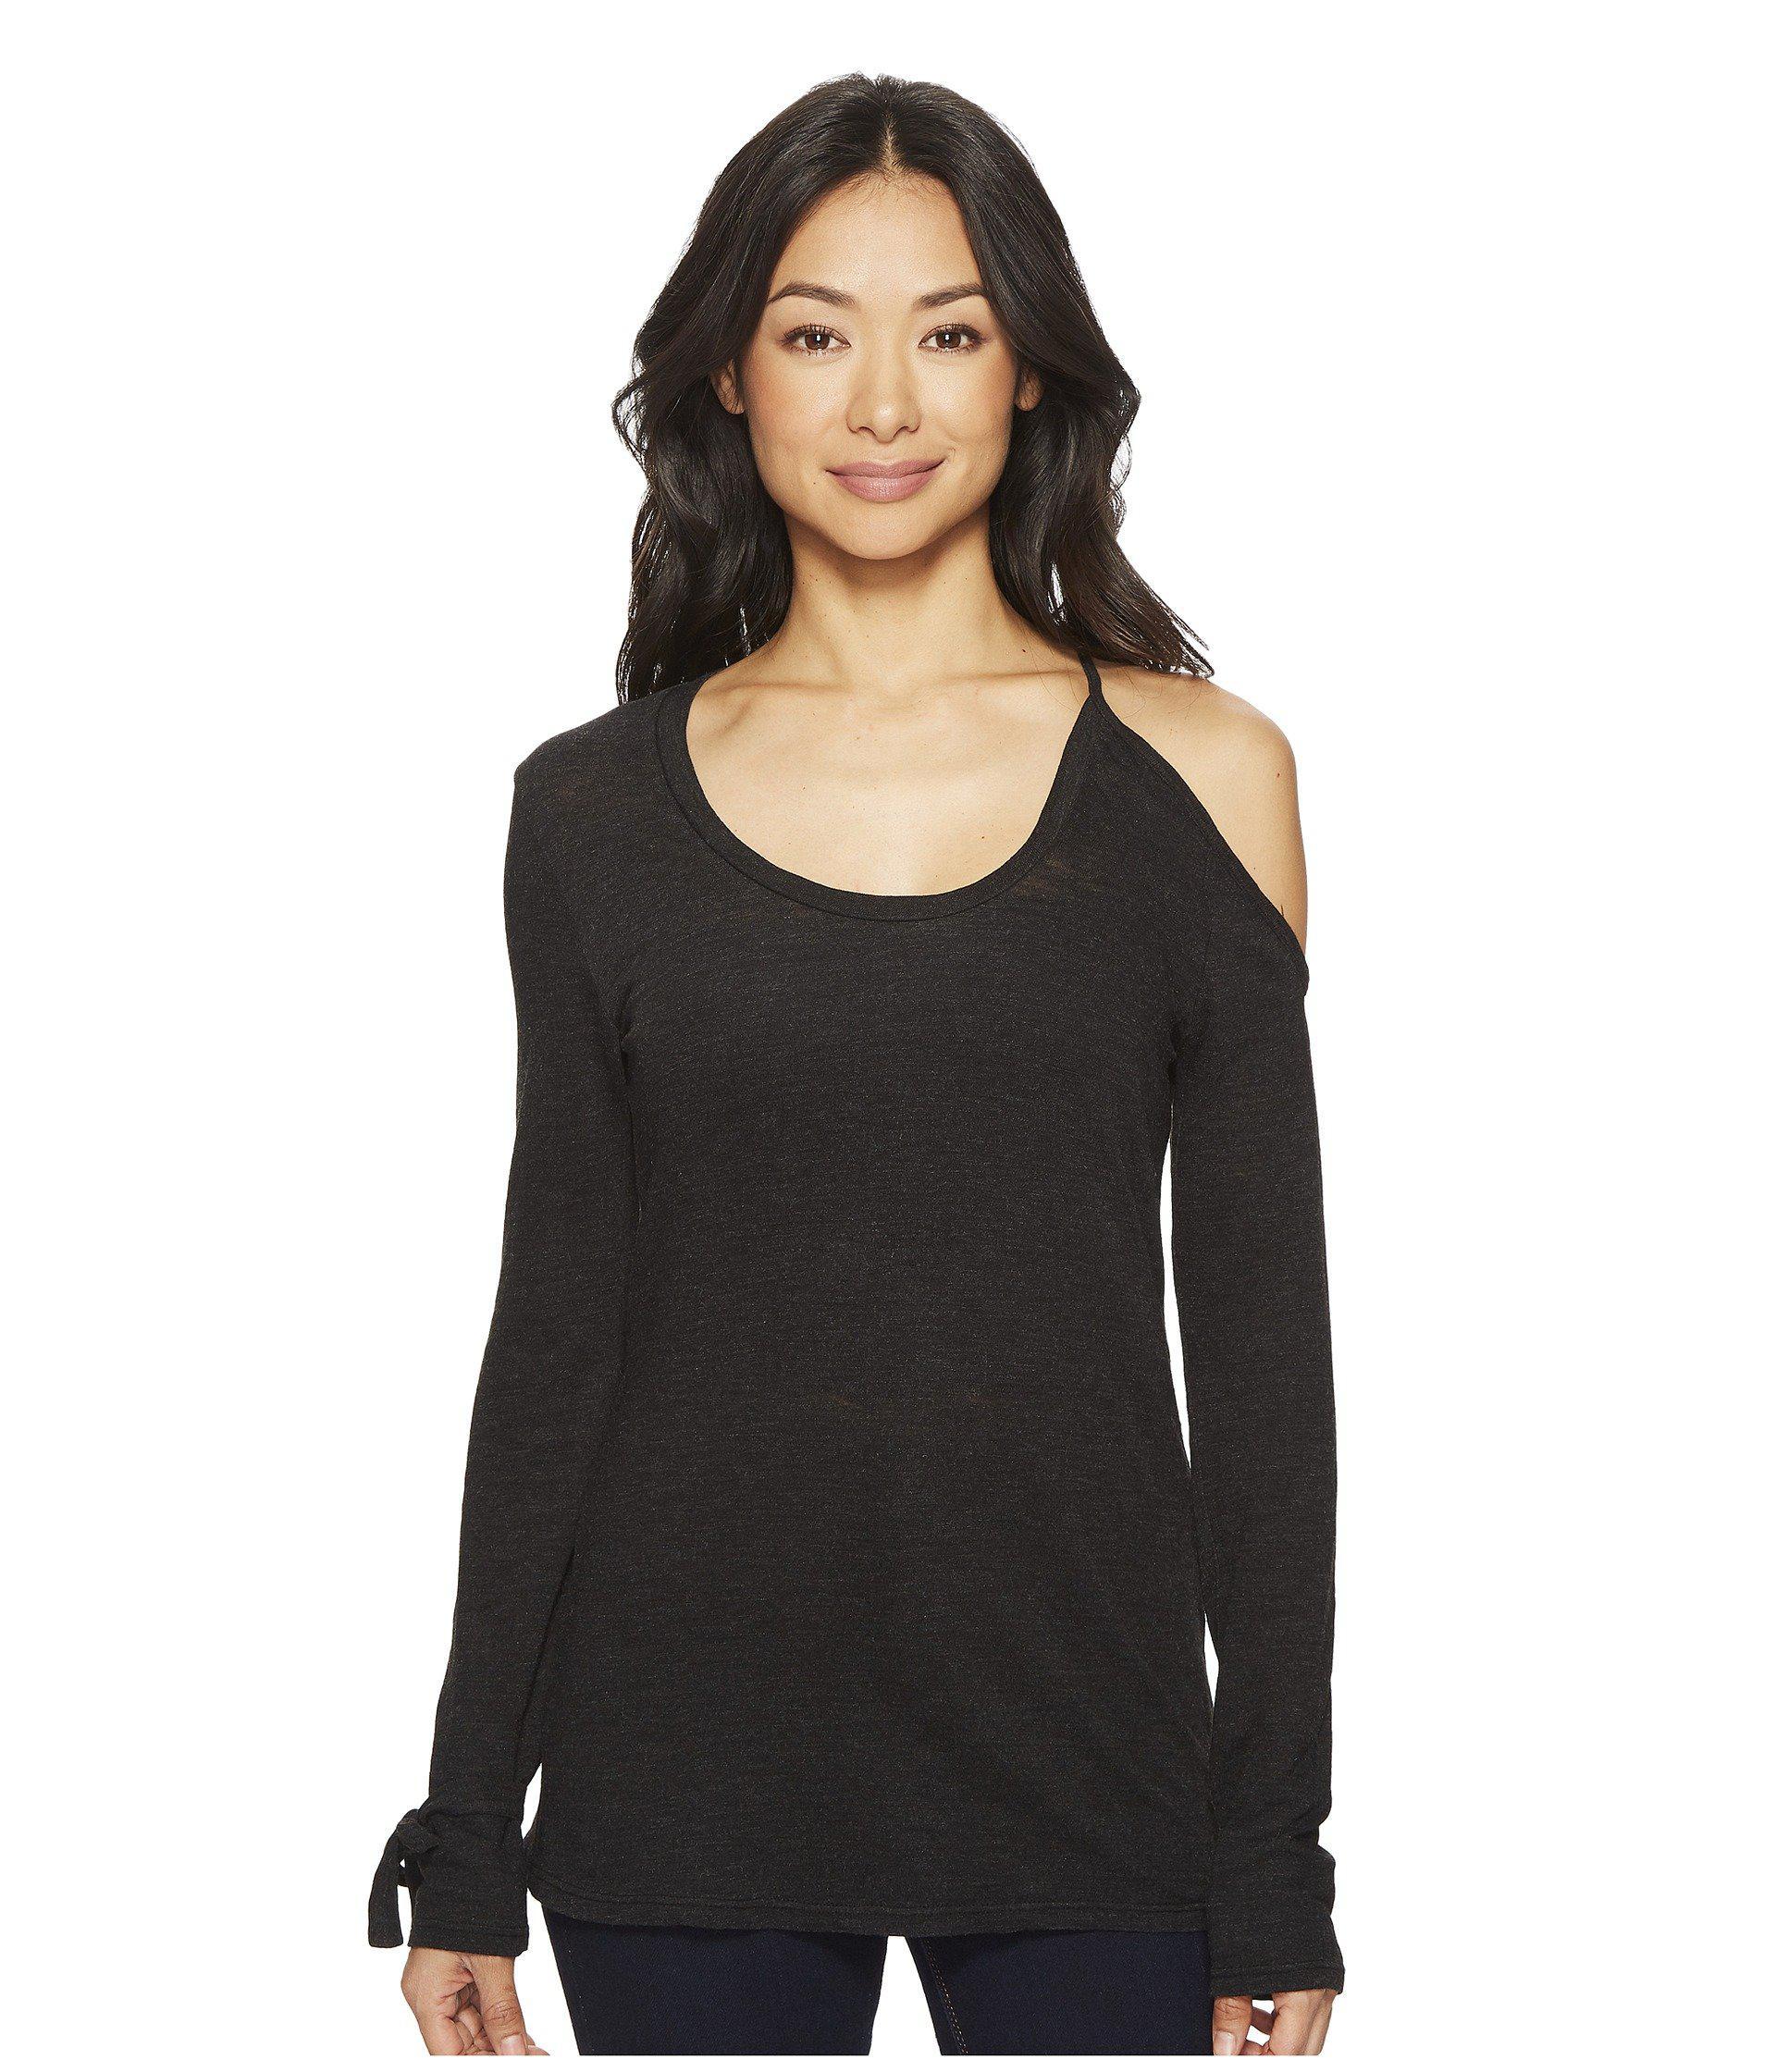 124ebf99b9c9d Lyst - Lanston Cold Shoulder Tie Long Sleeve Top in Black - Save 62%